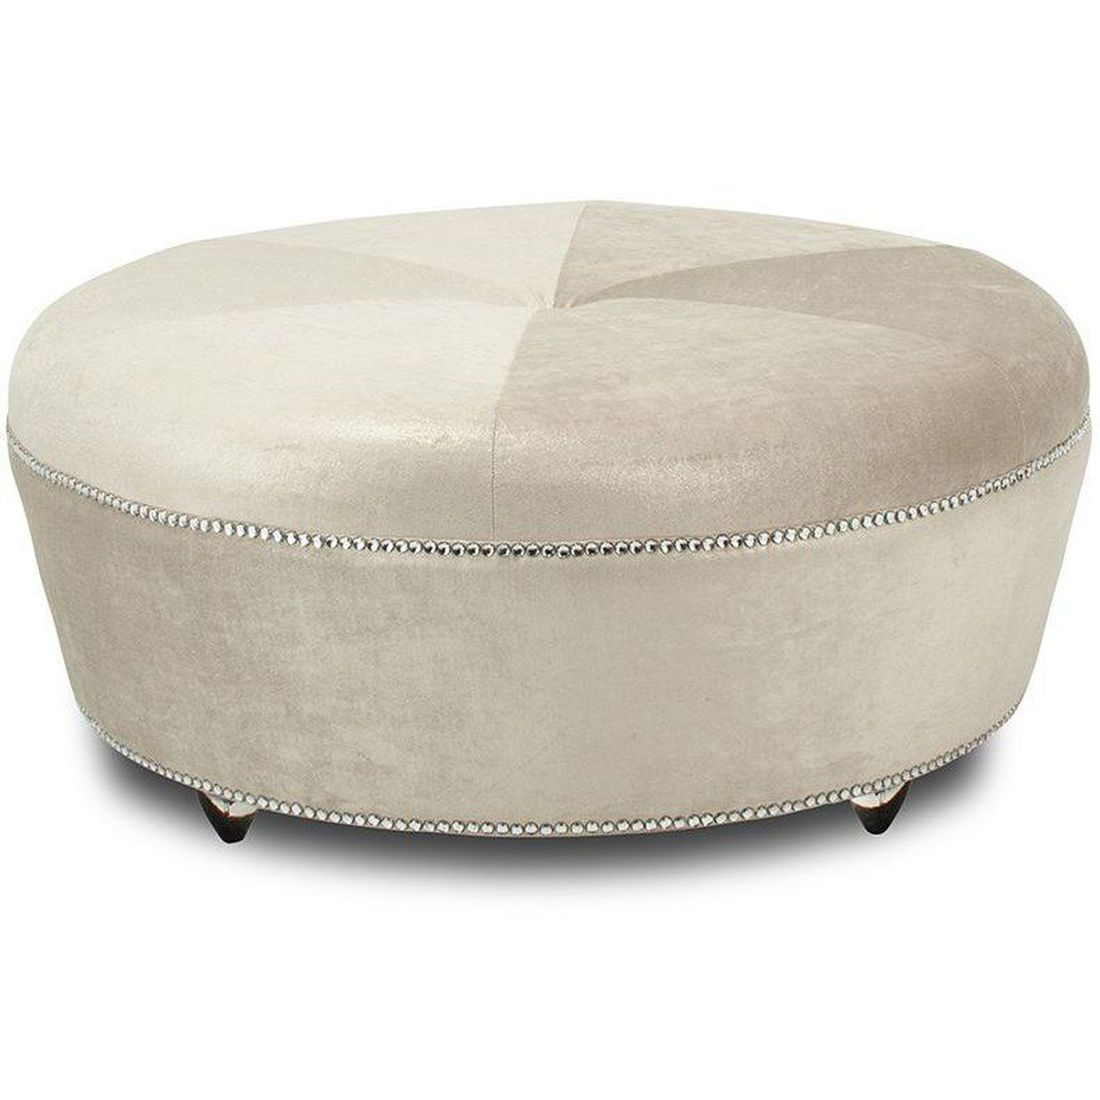 Best Aico Michael Amini Bel Air Park Button Sofa Living Room Set Round Ottoman Living Room Sets 400 x 300